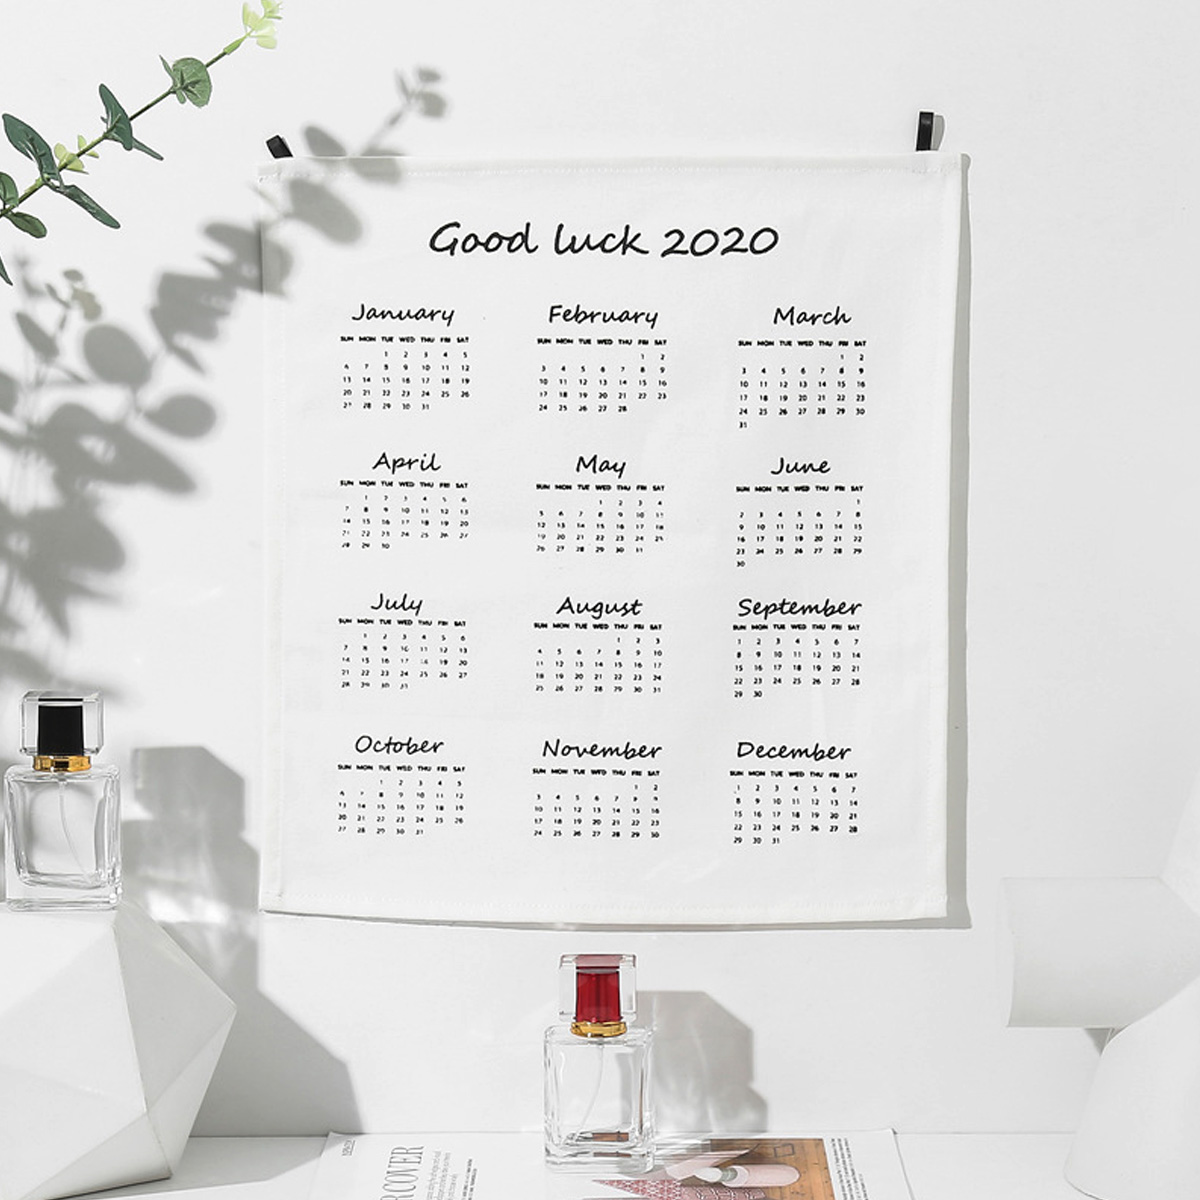 2020 Wall Calendar Fabric Printed Calendar Clock Yearly Diary Study Planner Advent Calendar Wall Hanging Calendar Home Office